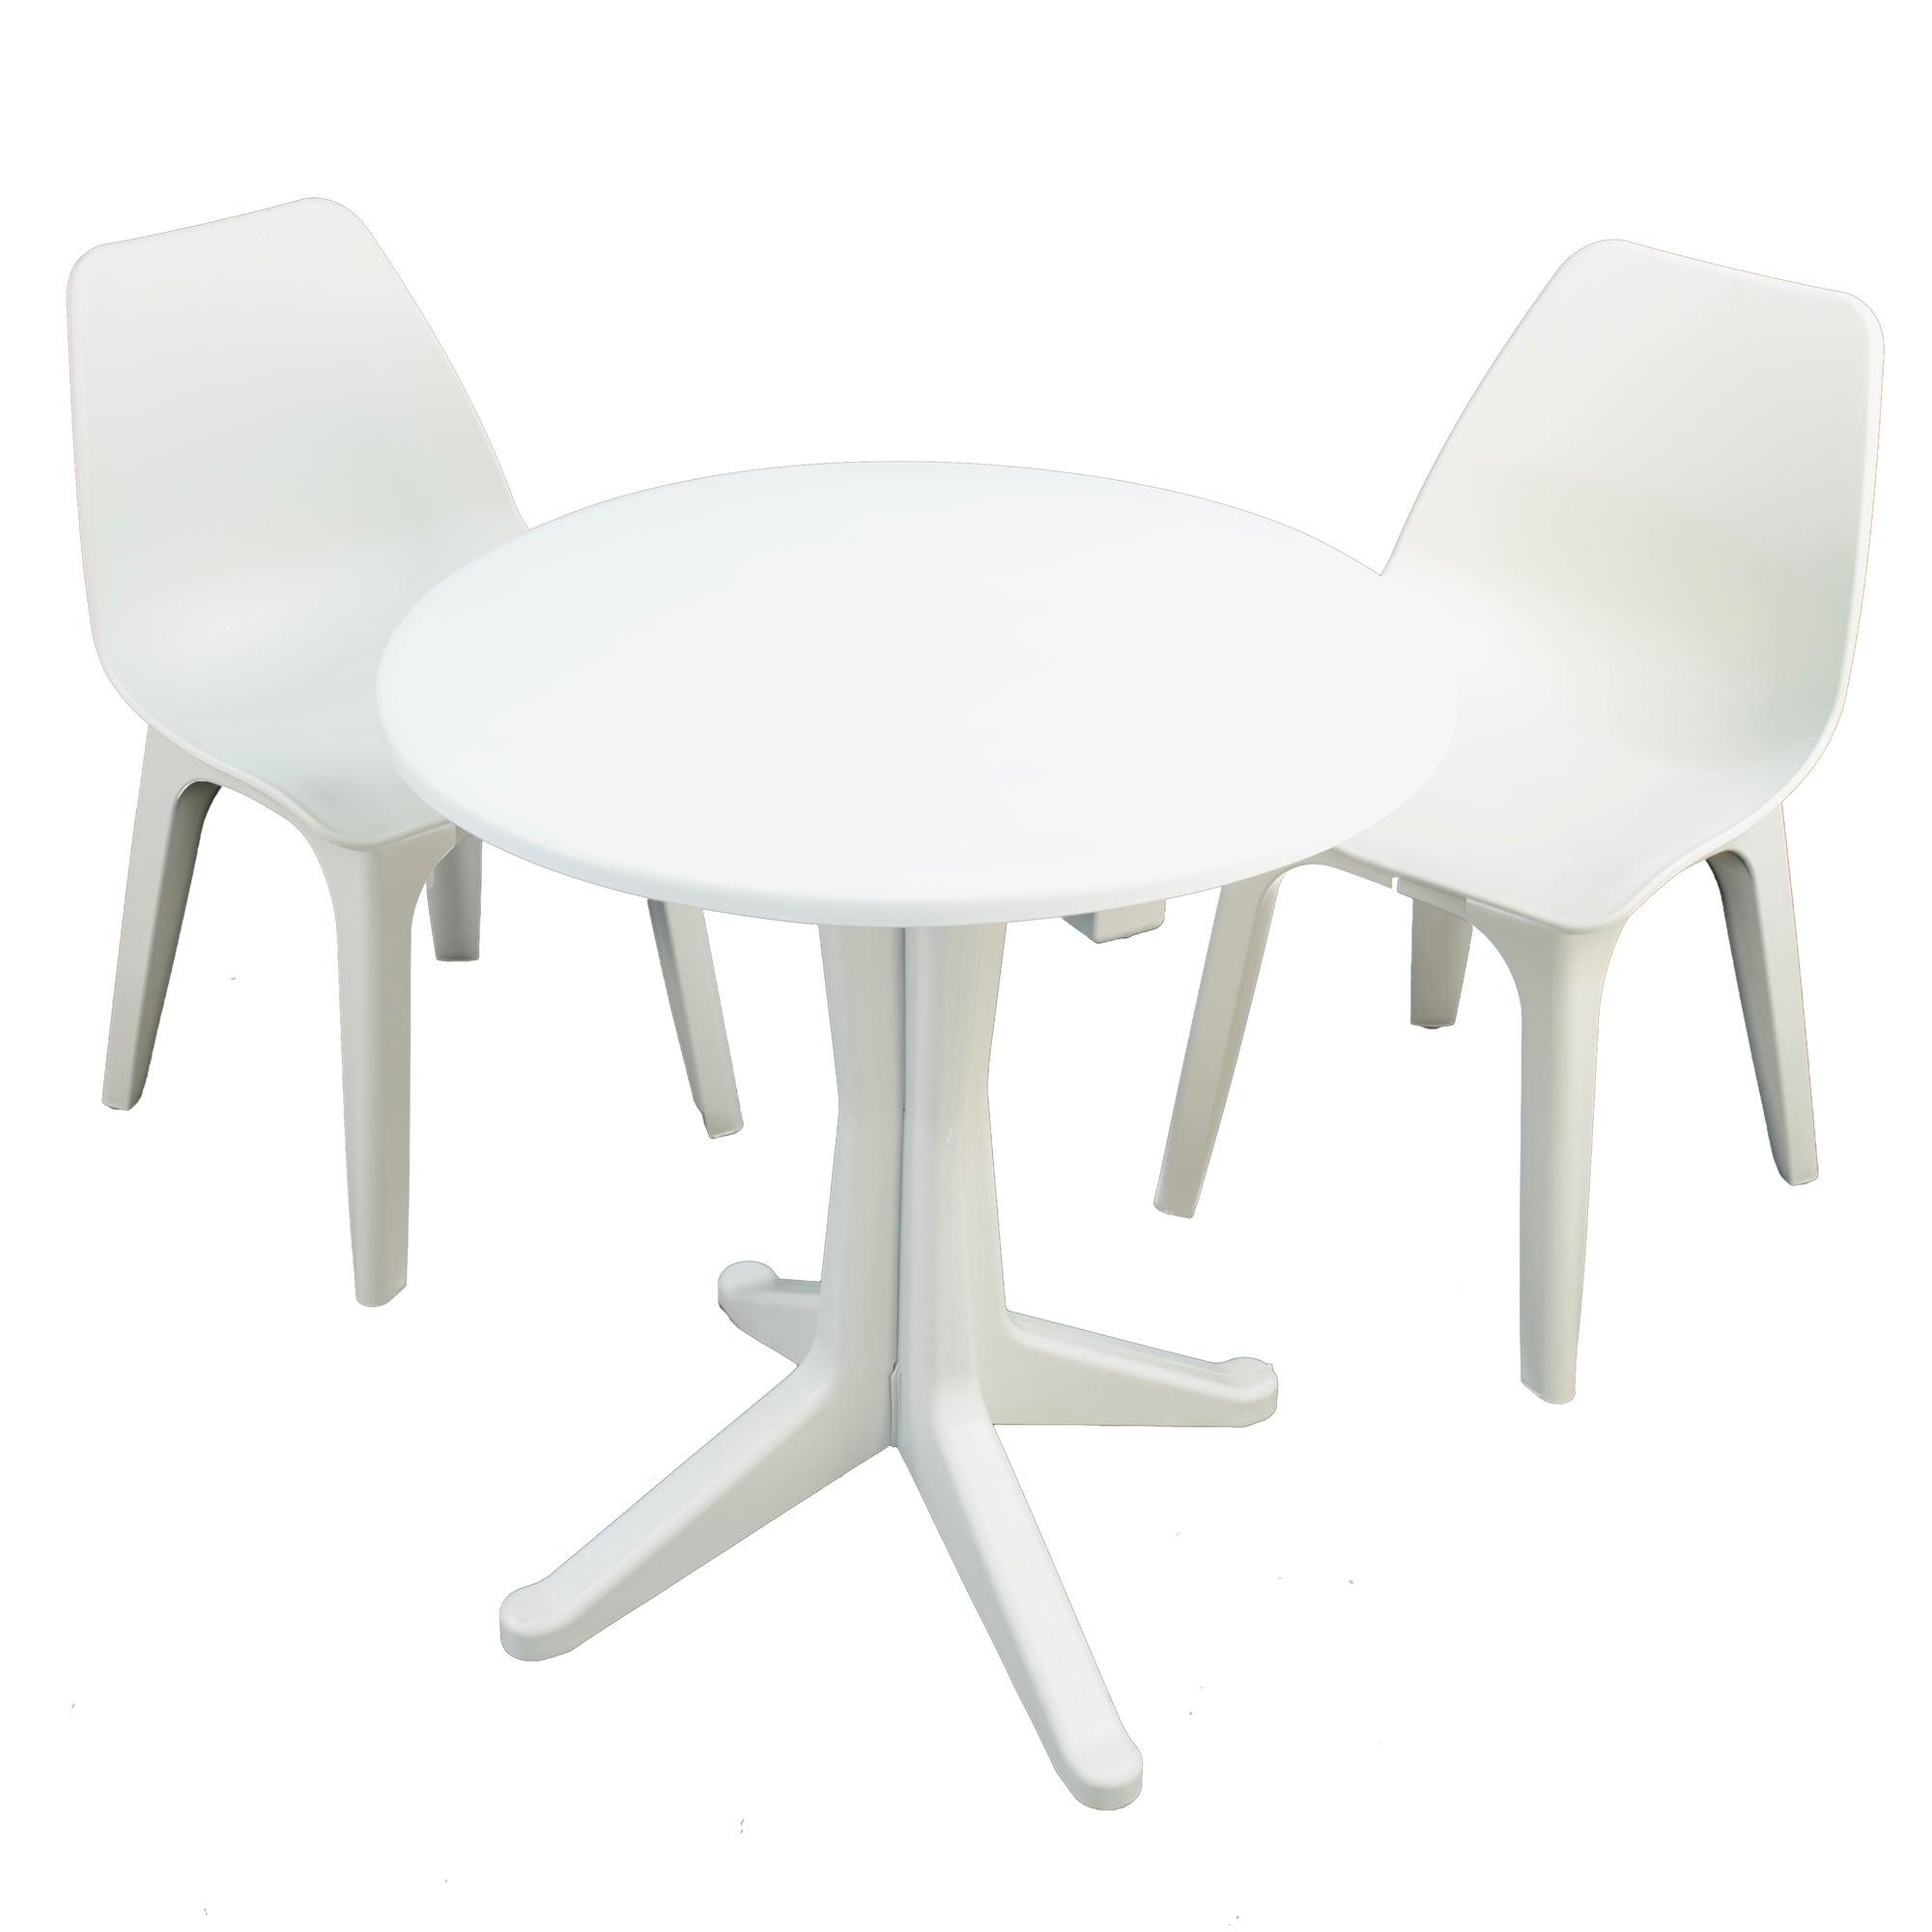 Levante 2 Seater White Bistro Set with Eolo Chairs White